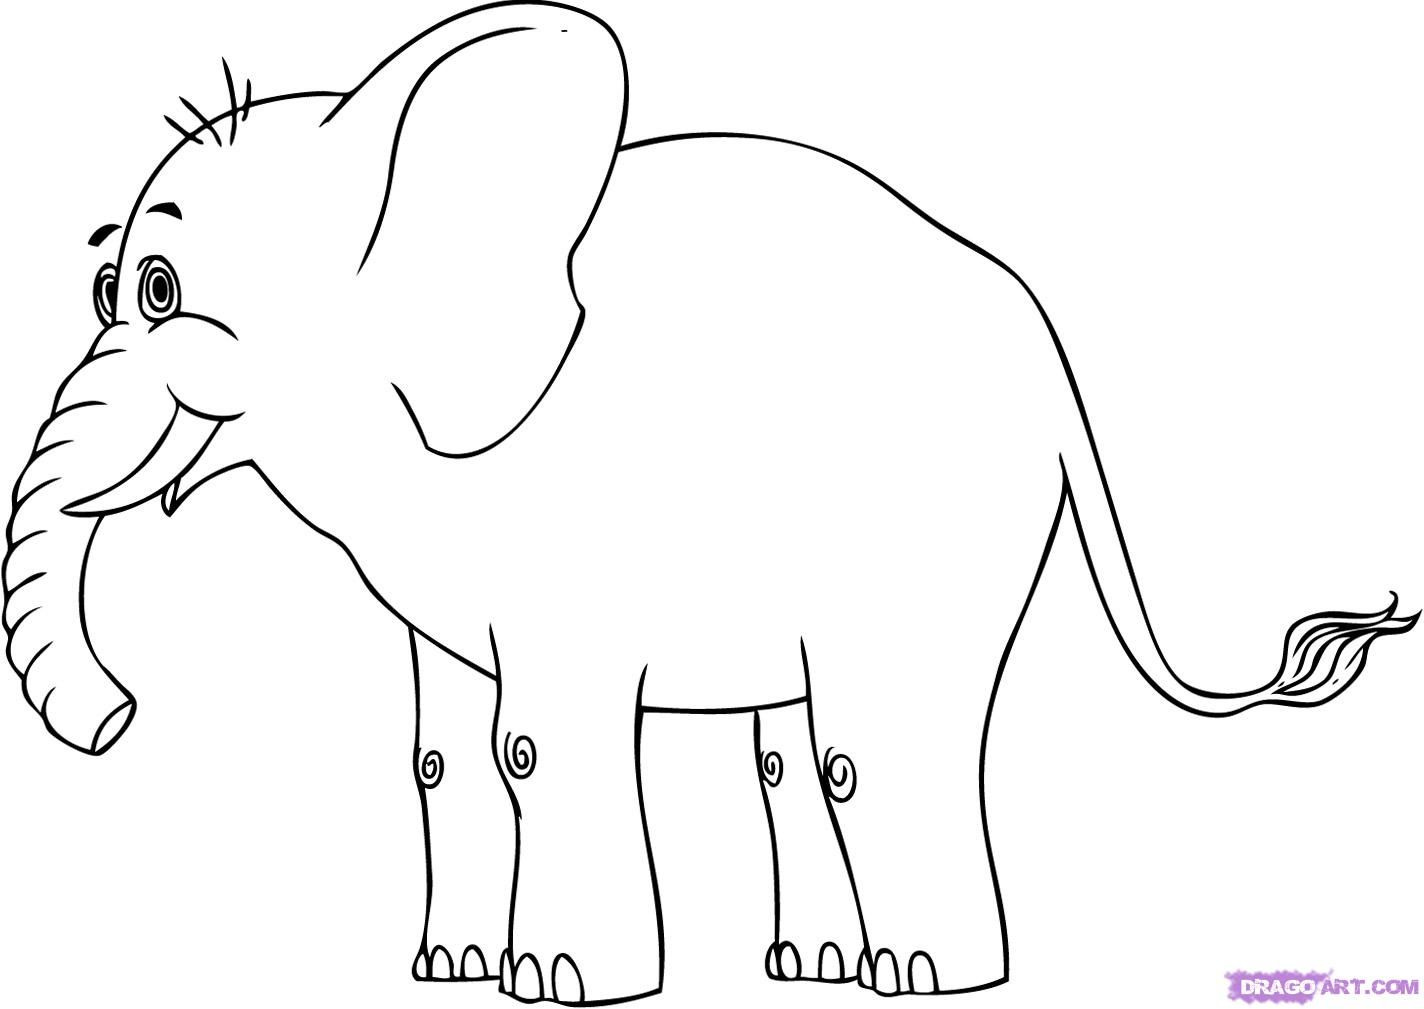 how to draw a cartoon elephant step 5 | Tree murals | Pinterest ...